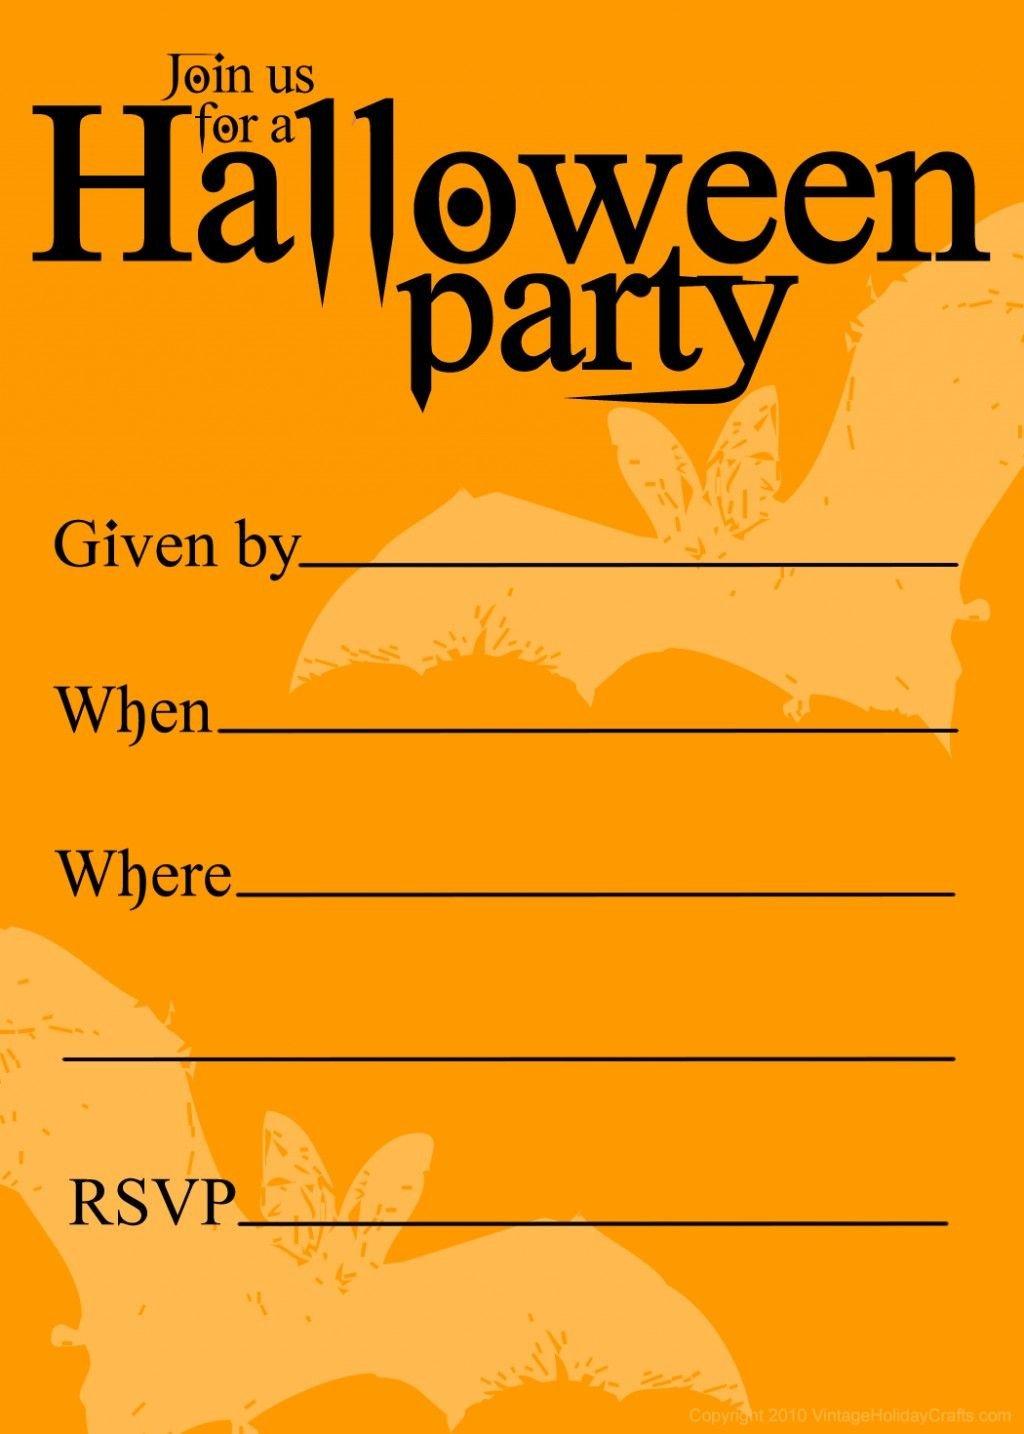 Free Halloween Invitation Templates Free Printable Halloween Birthday Invitations Templates